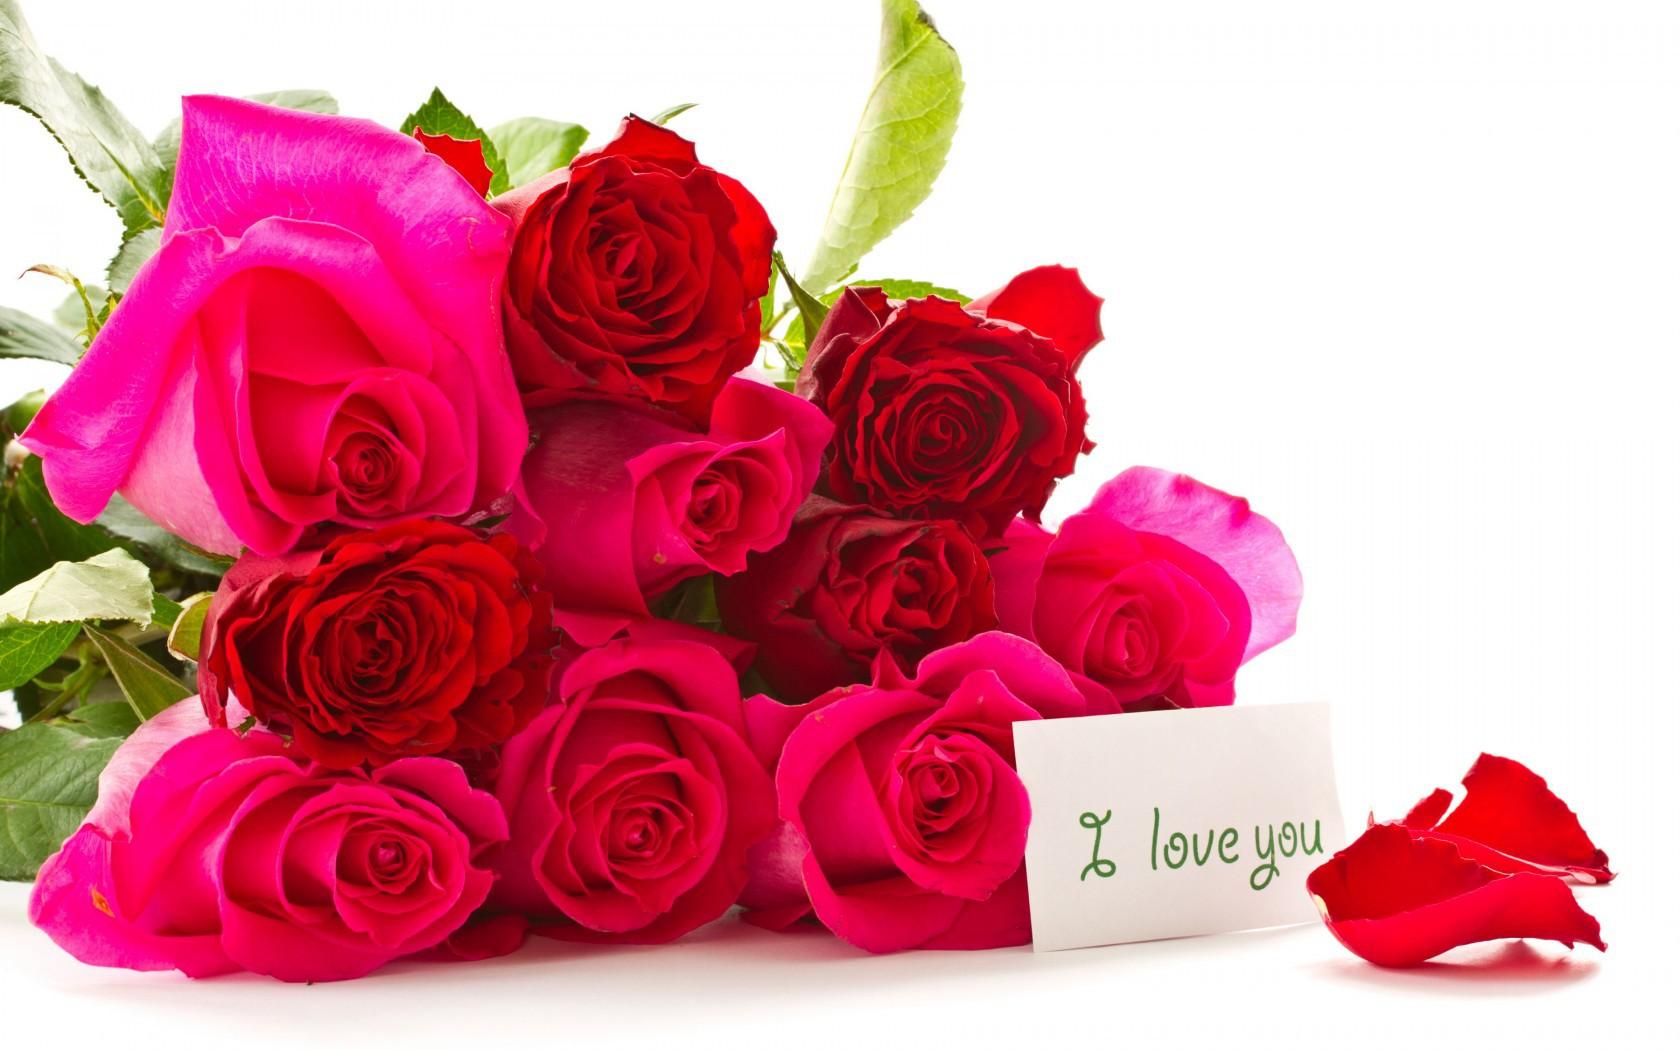 Поздравление с юбилеем с розами